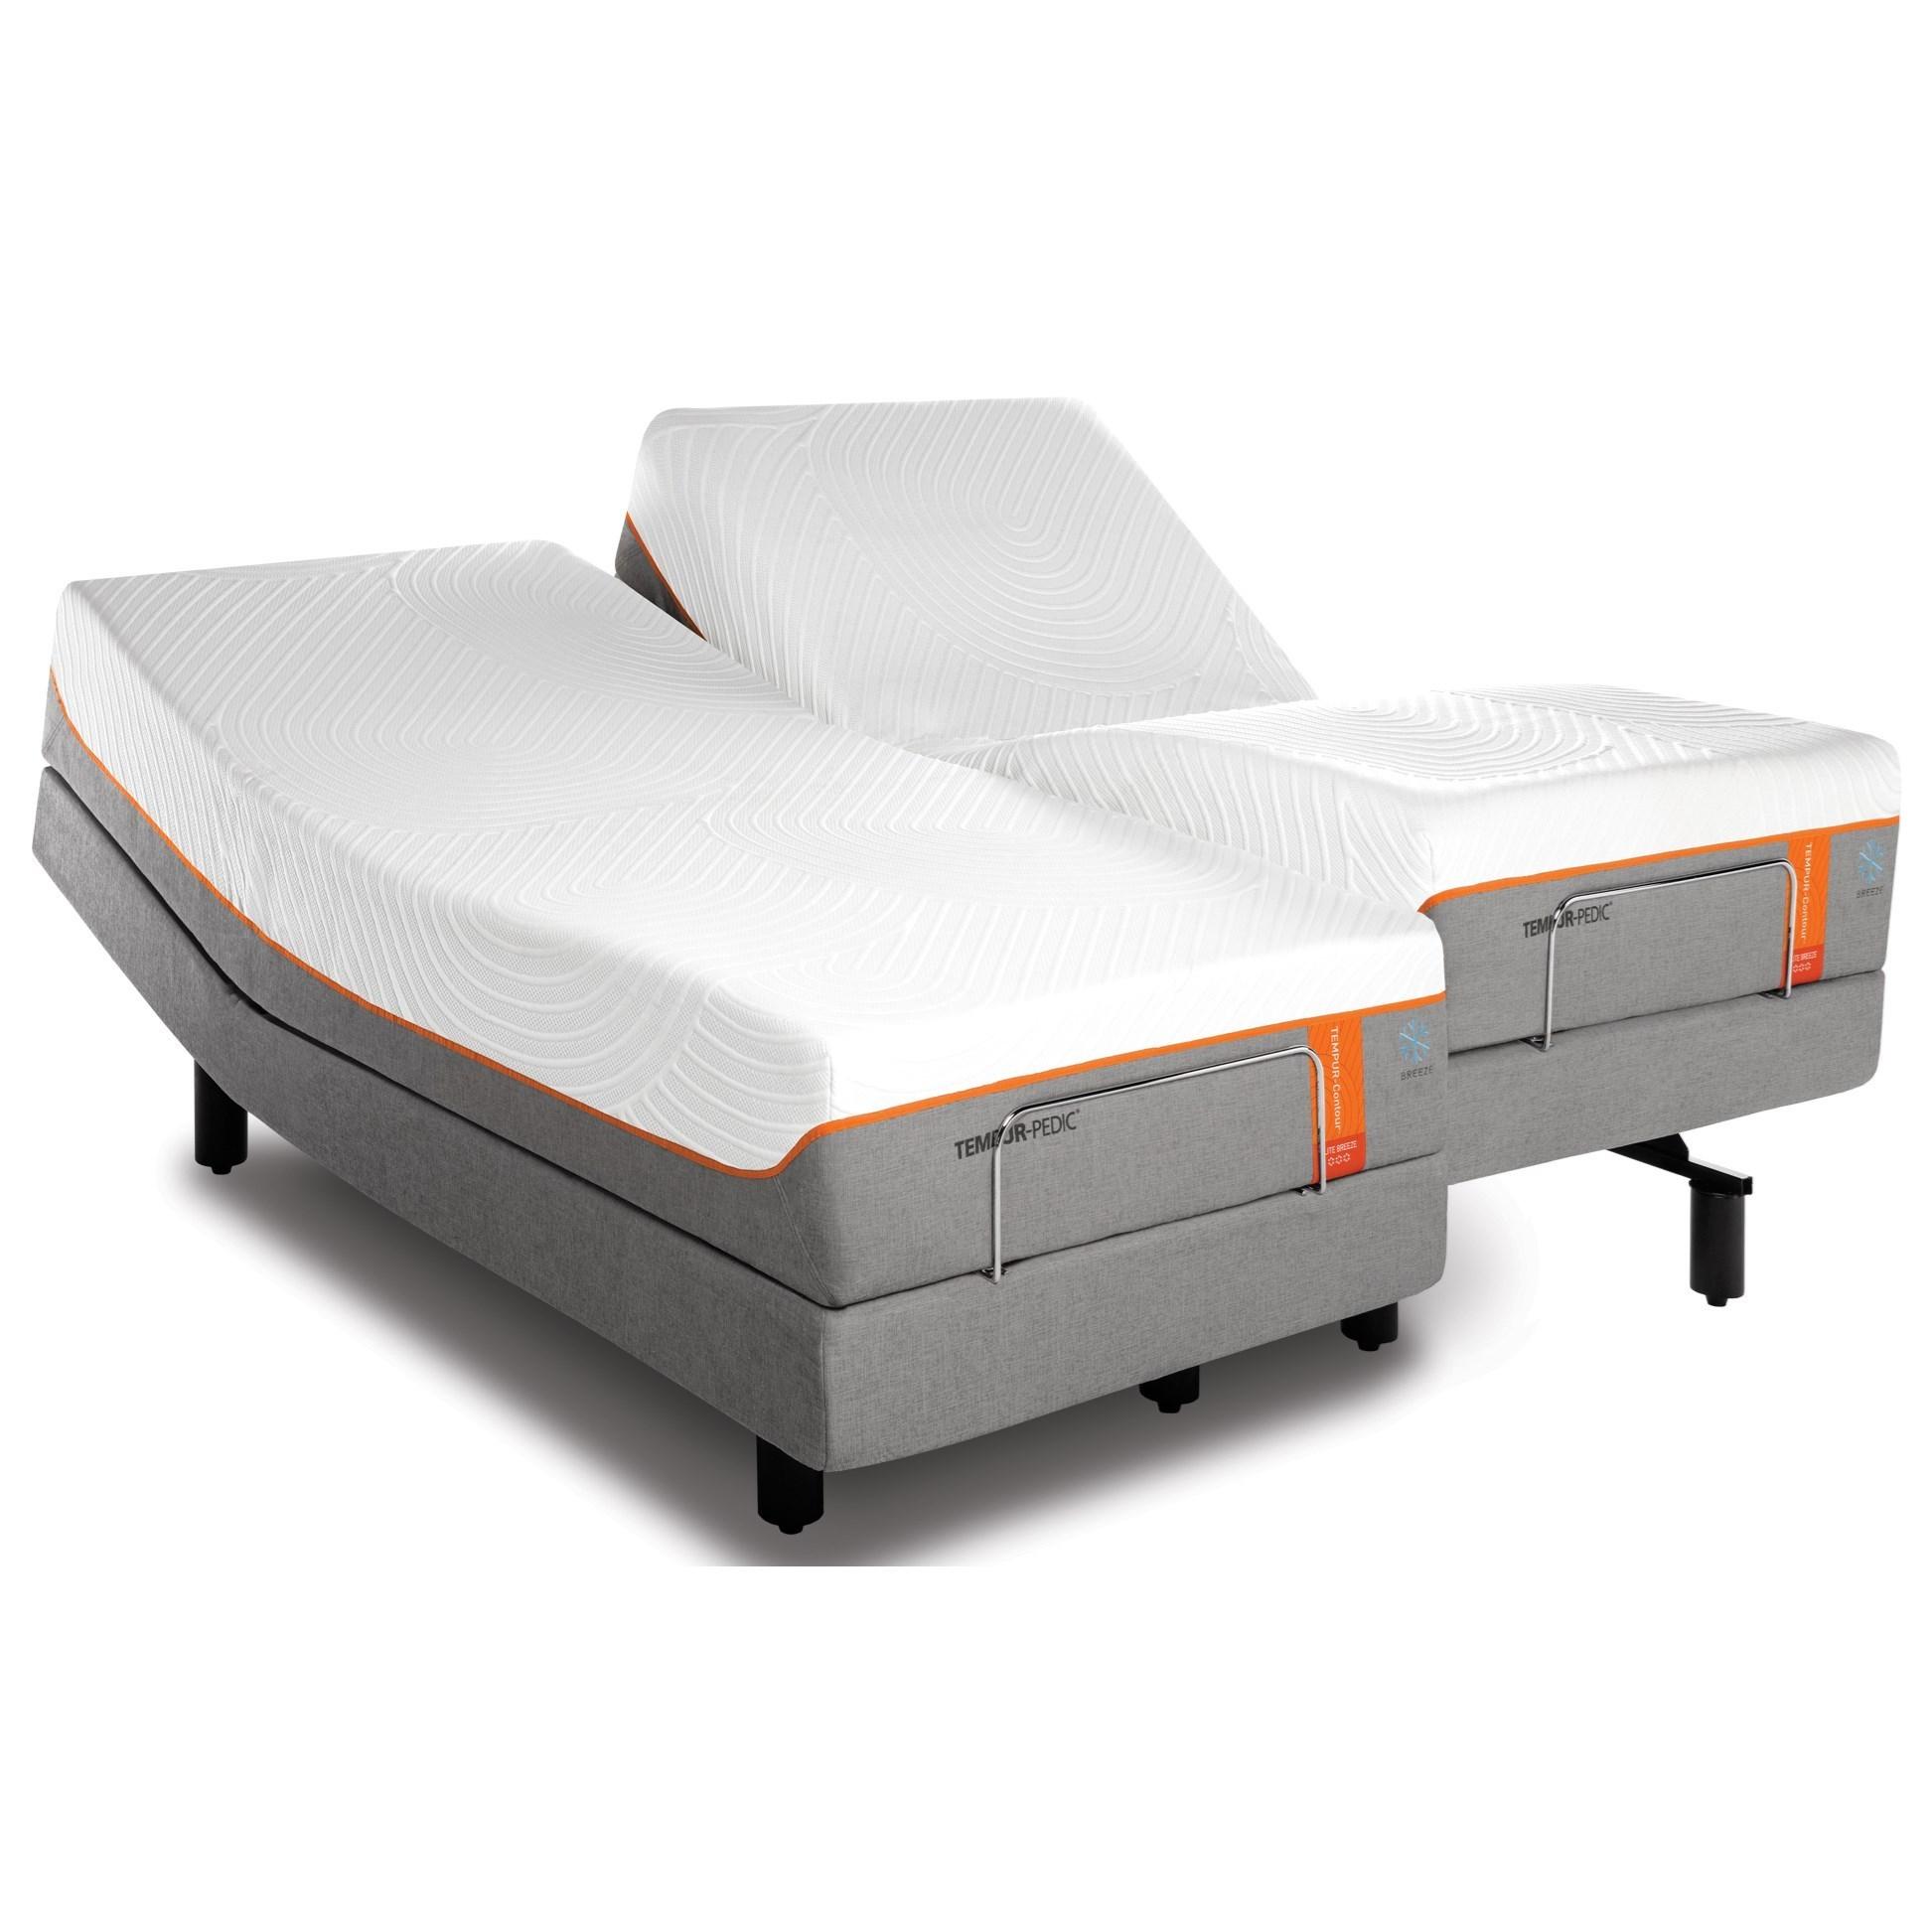 Tempur-Pedic® TEMPUR-Contour Elite Breeze California King Medium-Firm Mattress Set - Item Number: 10290280+2x25565290